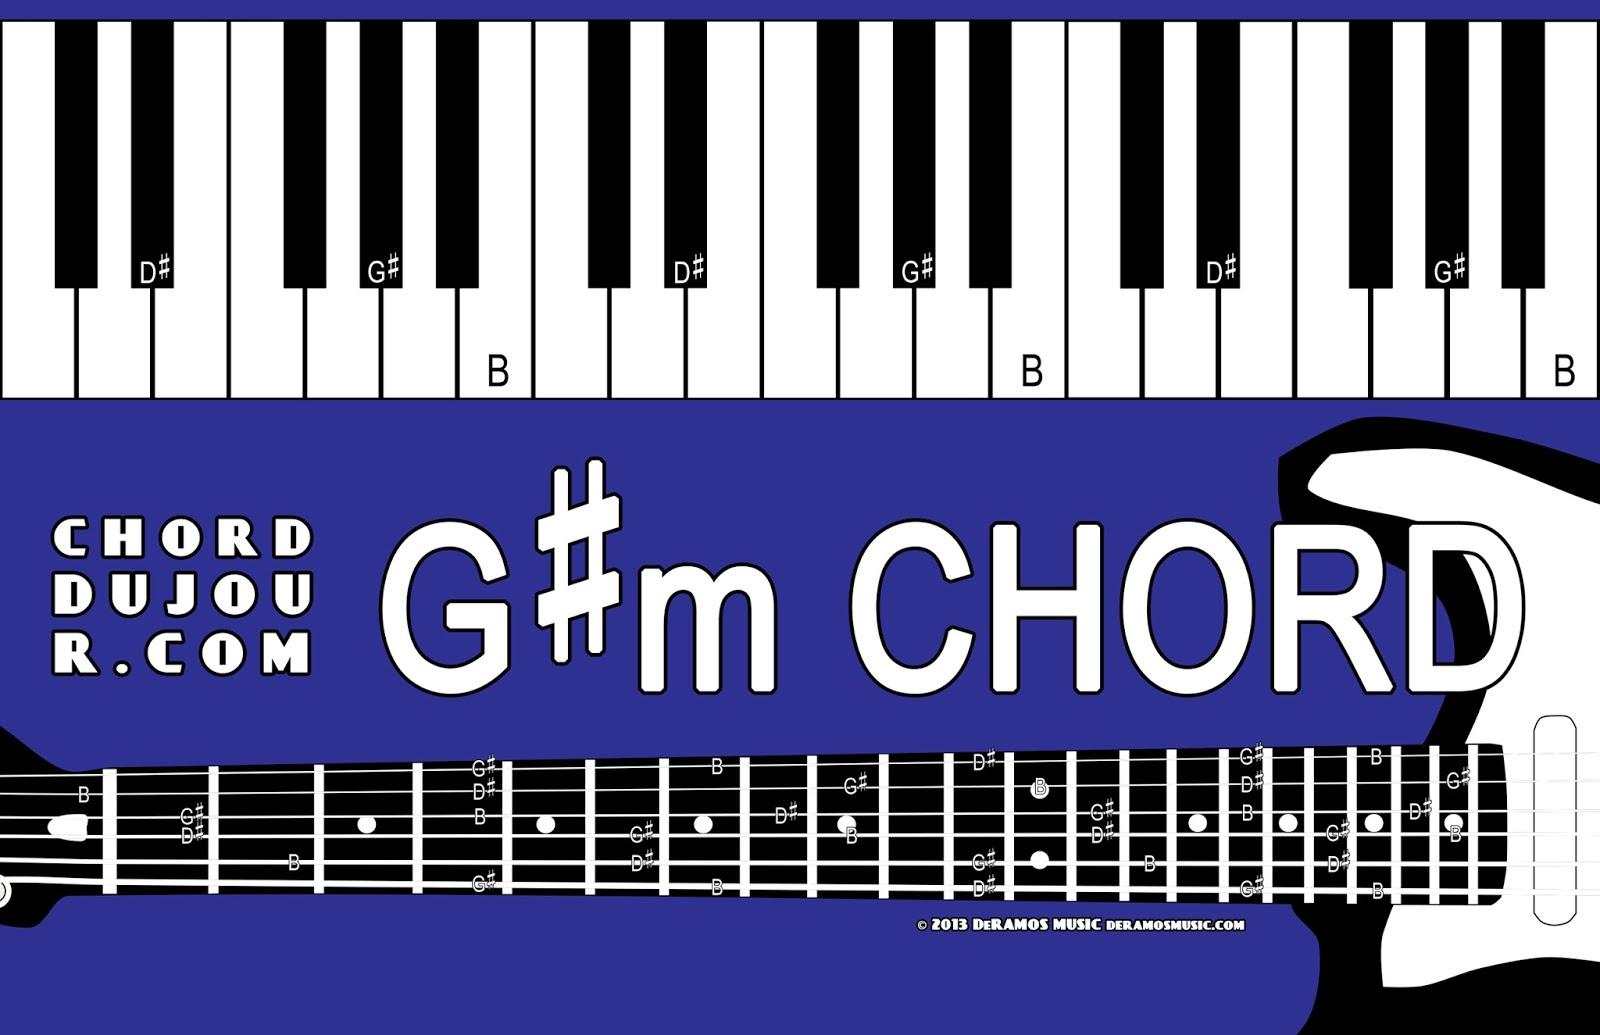 Chord Du Jour Dictionary Gm Chord